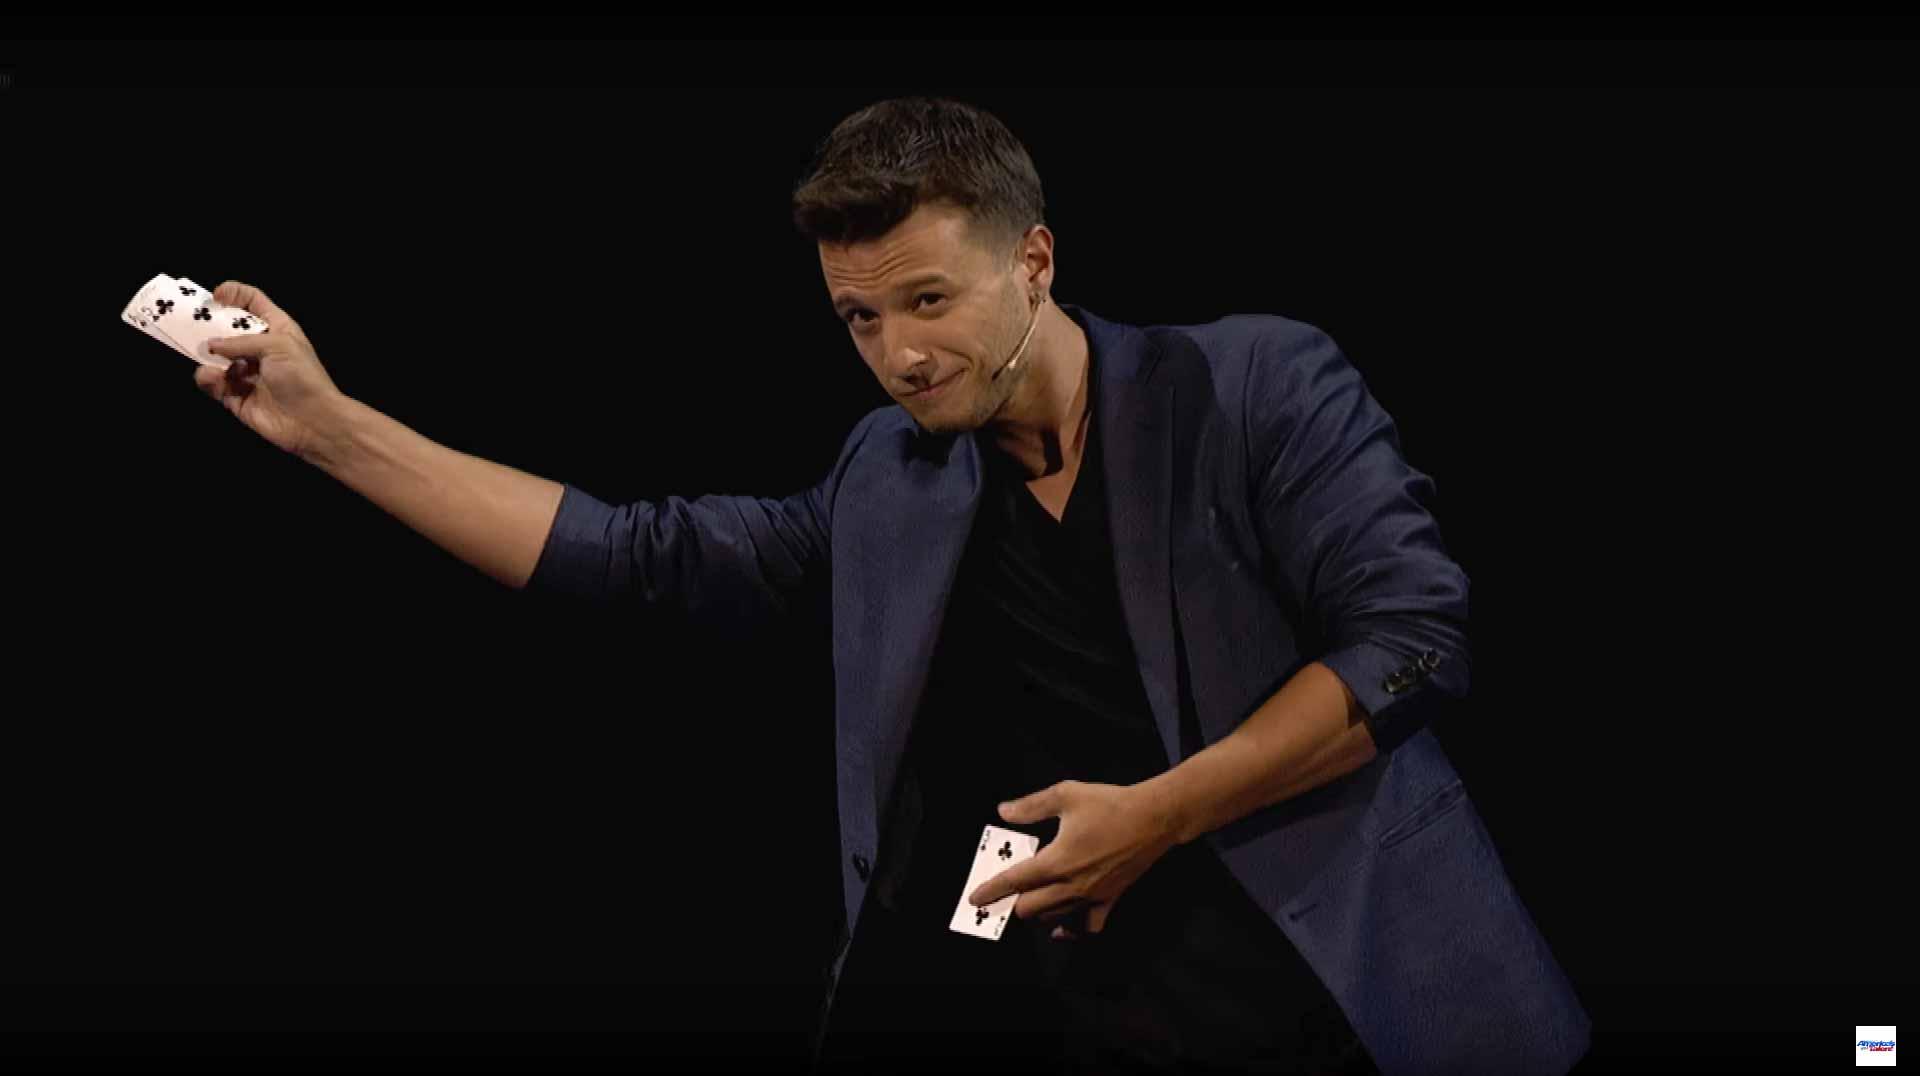 Magician Tanba trick revealed! - Easy Magic Tricks